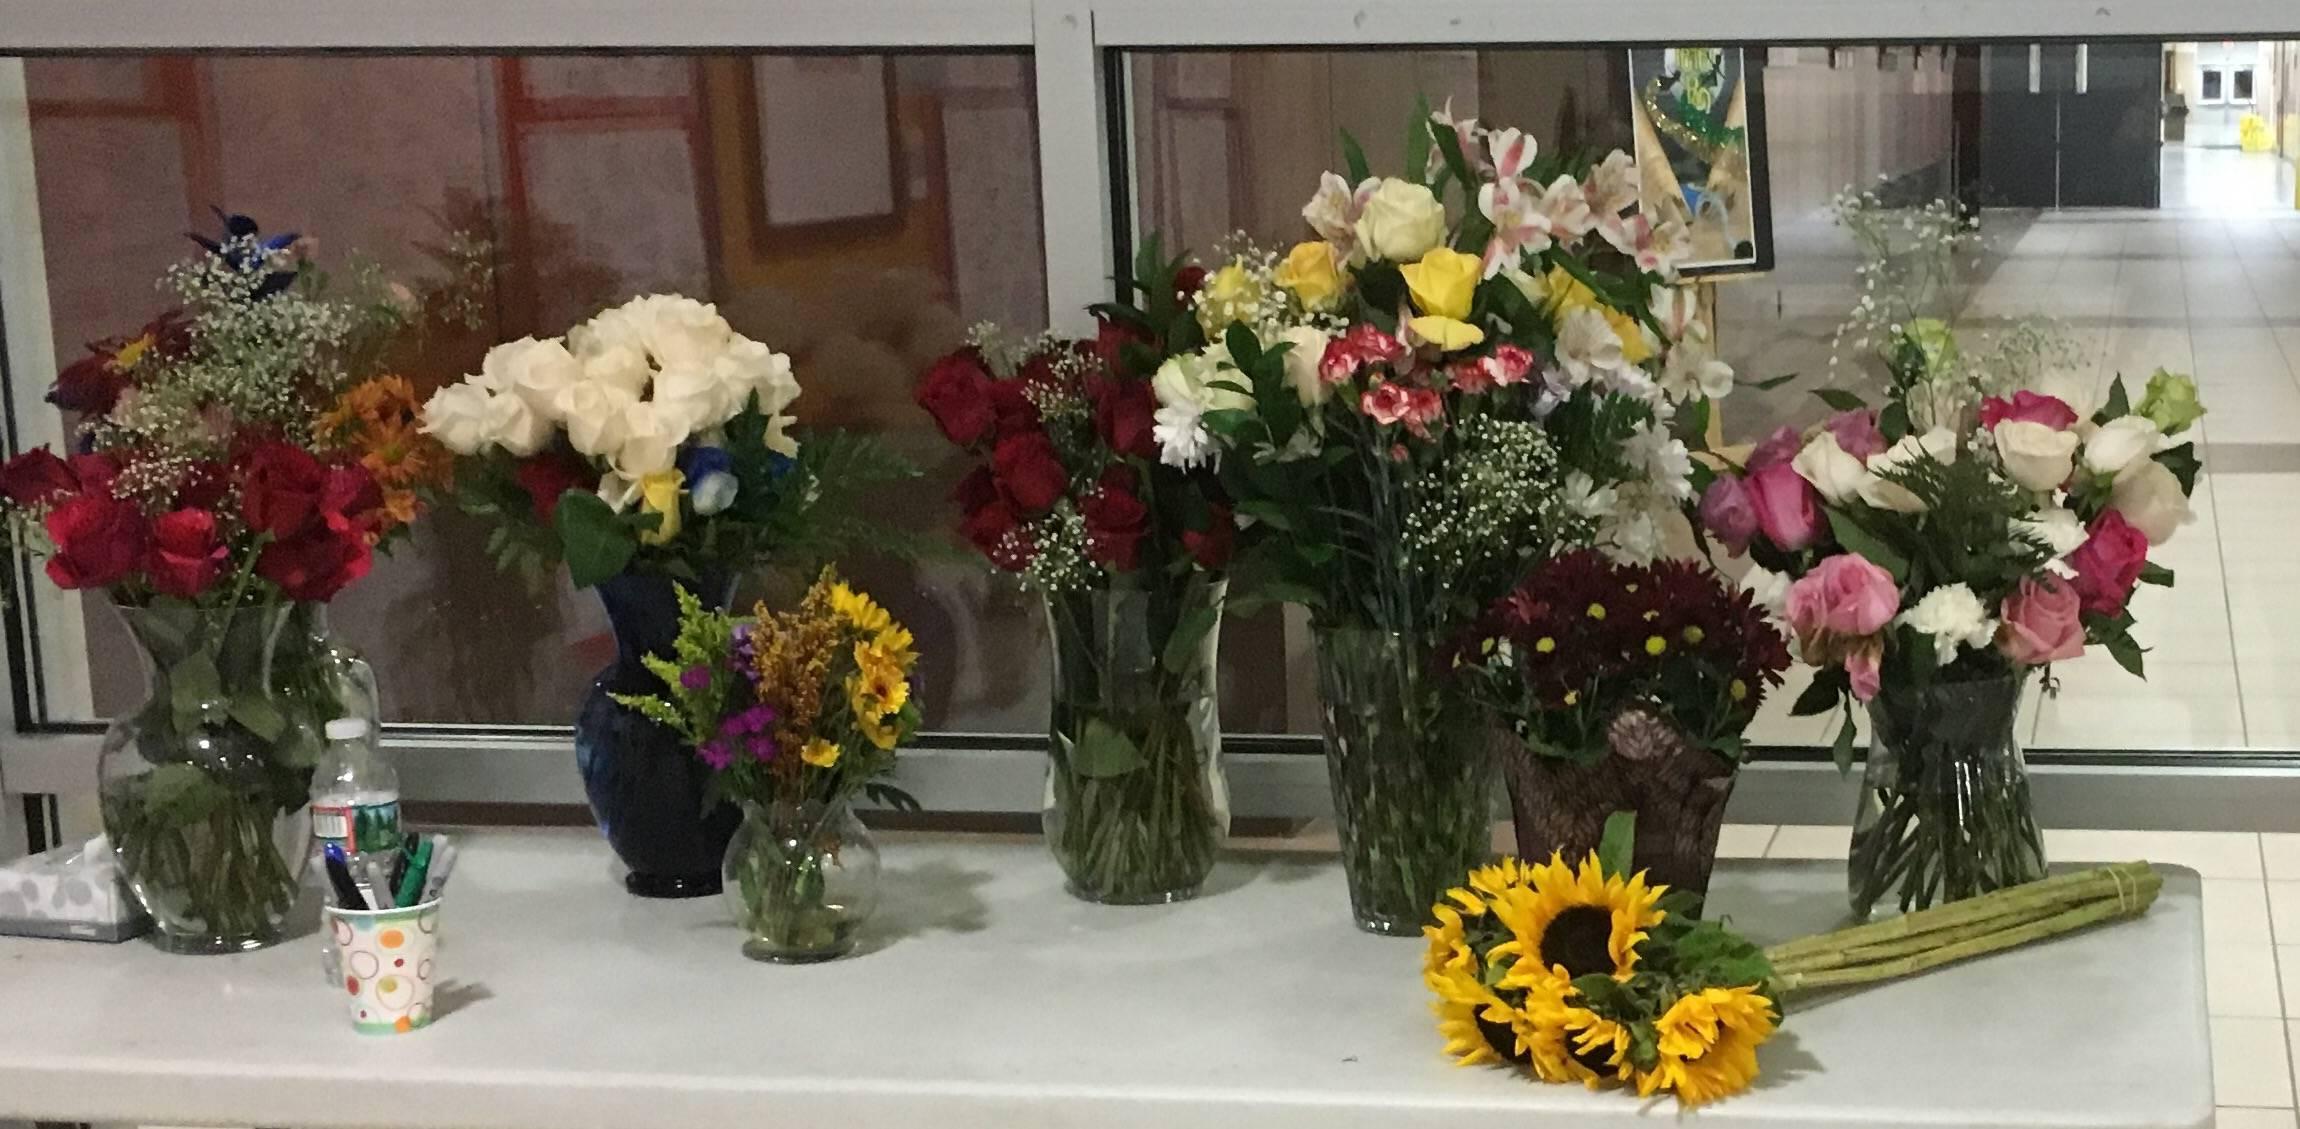 Remembering juan carlos cruz visitation and funeral arrangements 7f54313c6b0a37d7cec1img2064g izmirmasajfo Image collections